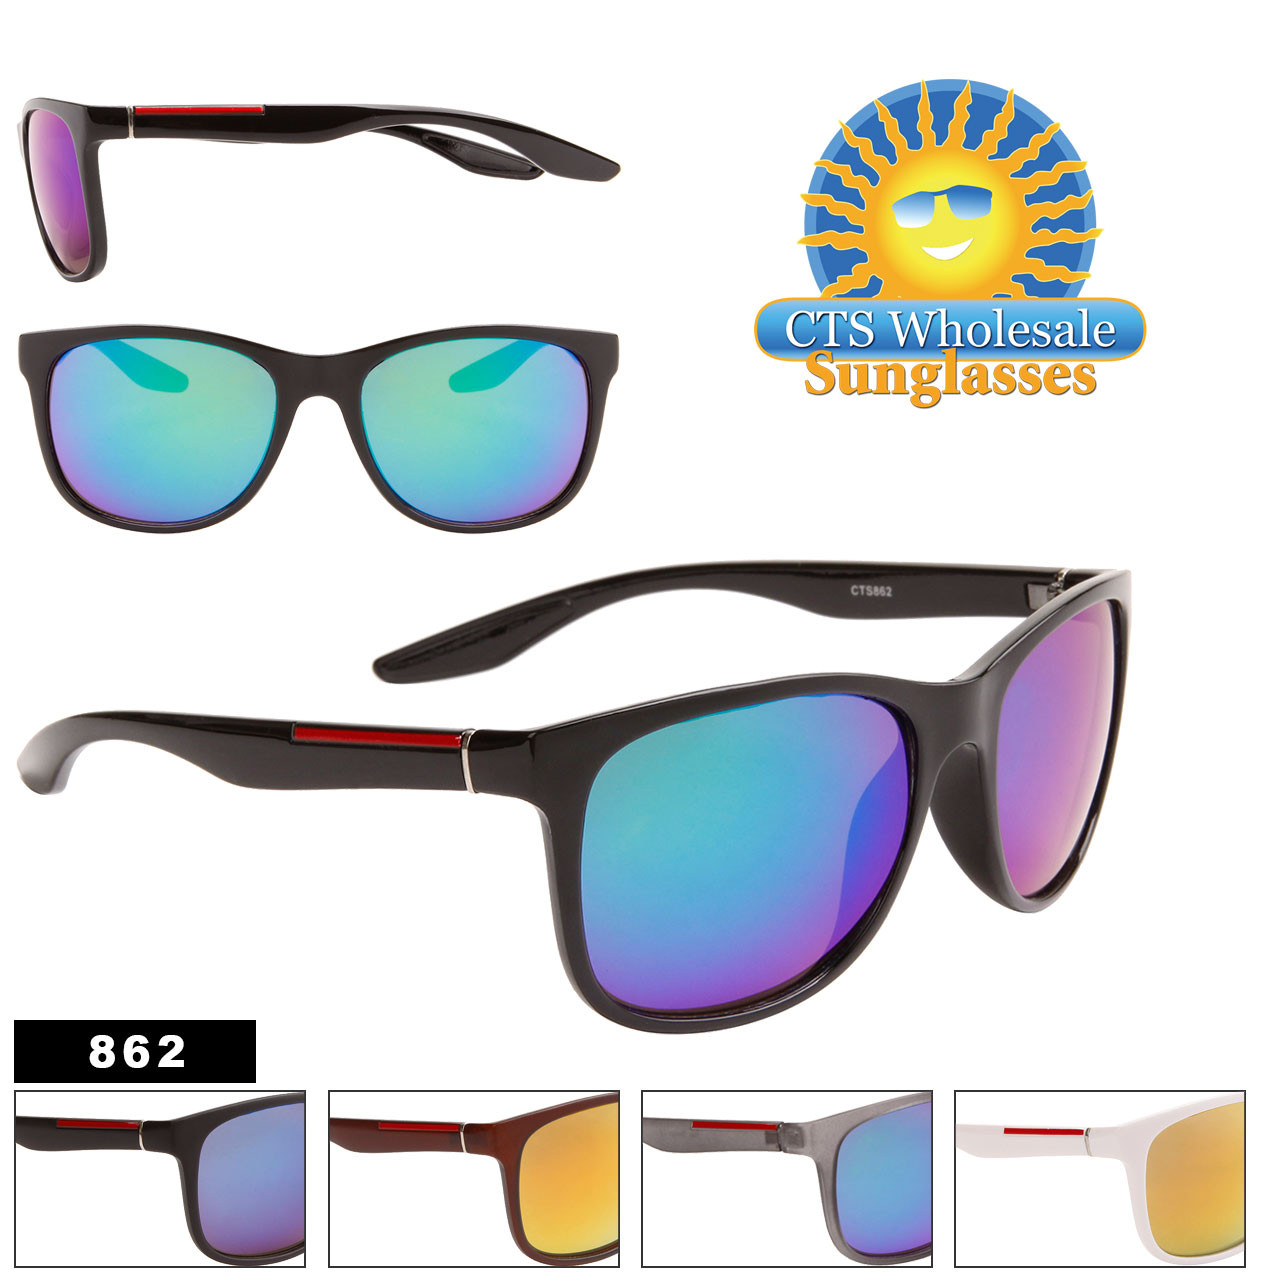 Mirrored Unisex Wholesale Sunglasses - Style #862